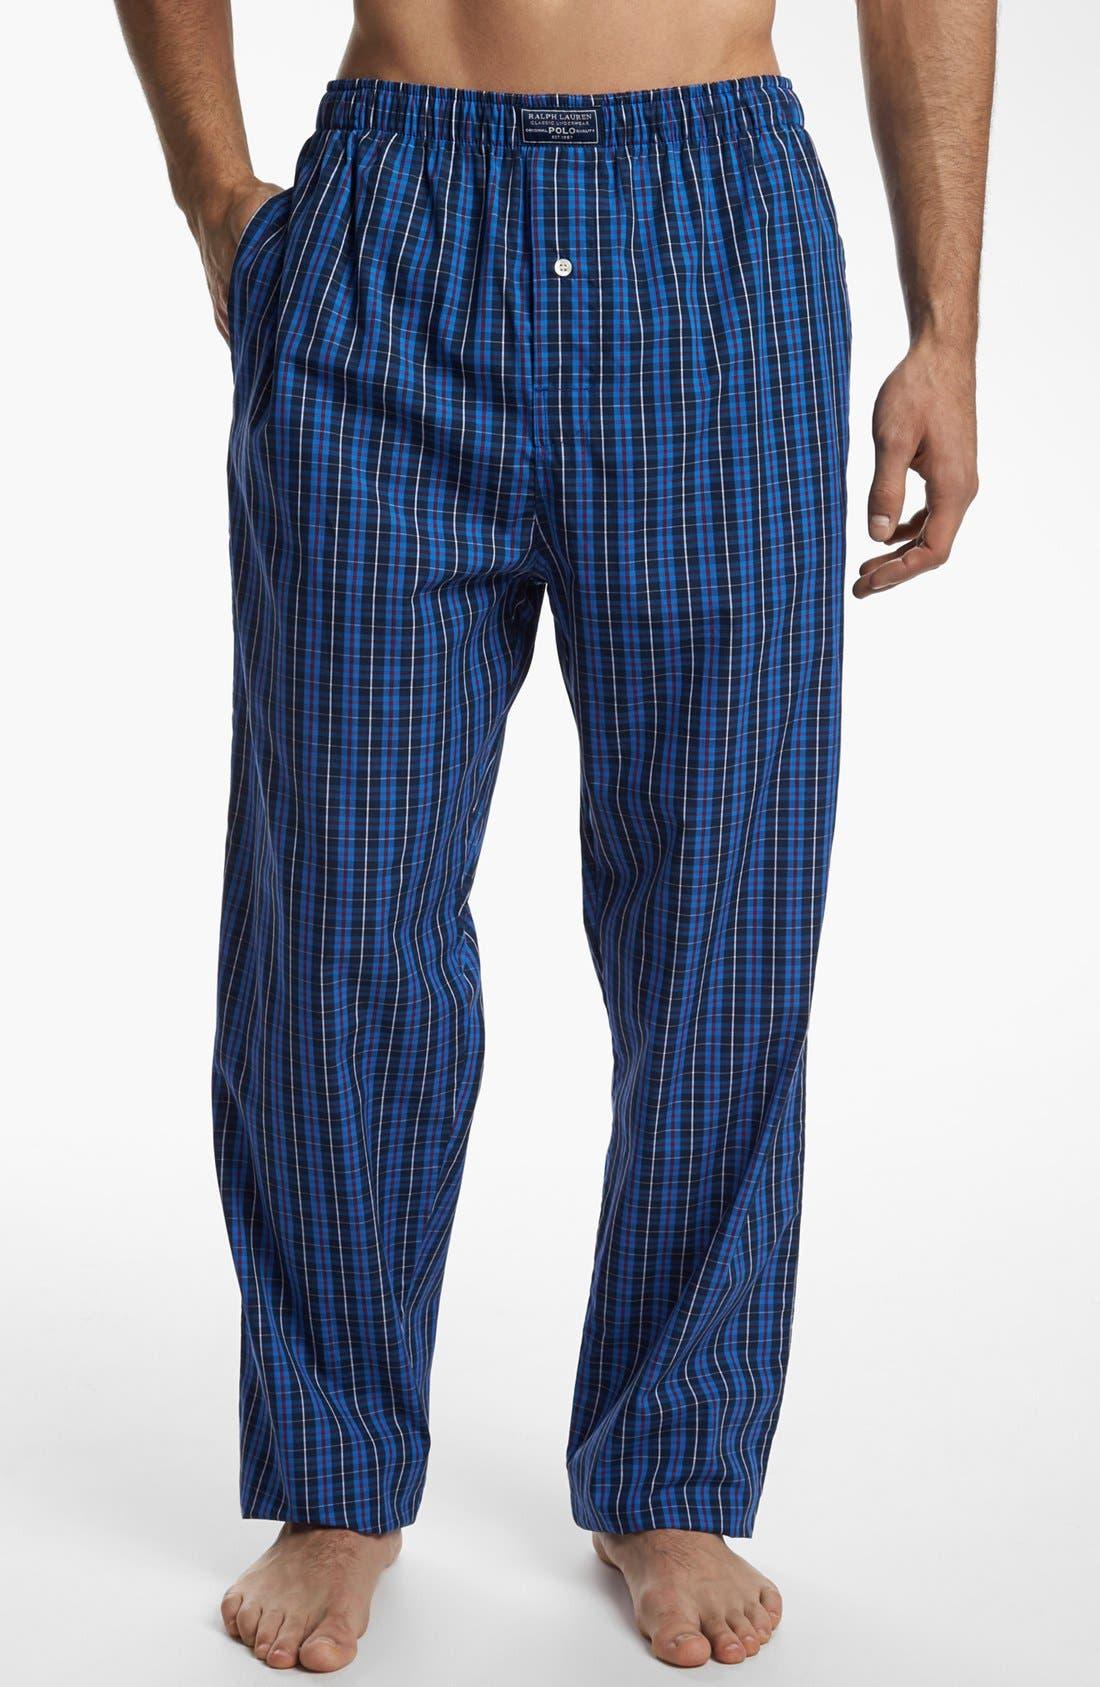 POLO RALPH LAUREN,                             Woven Pajama Pants,                             Main thumbnail 1, color,                             HARWICH PLAID